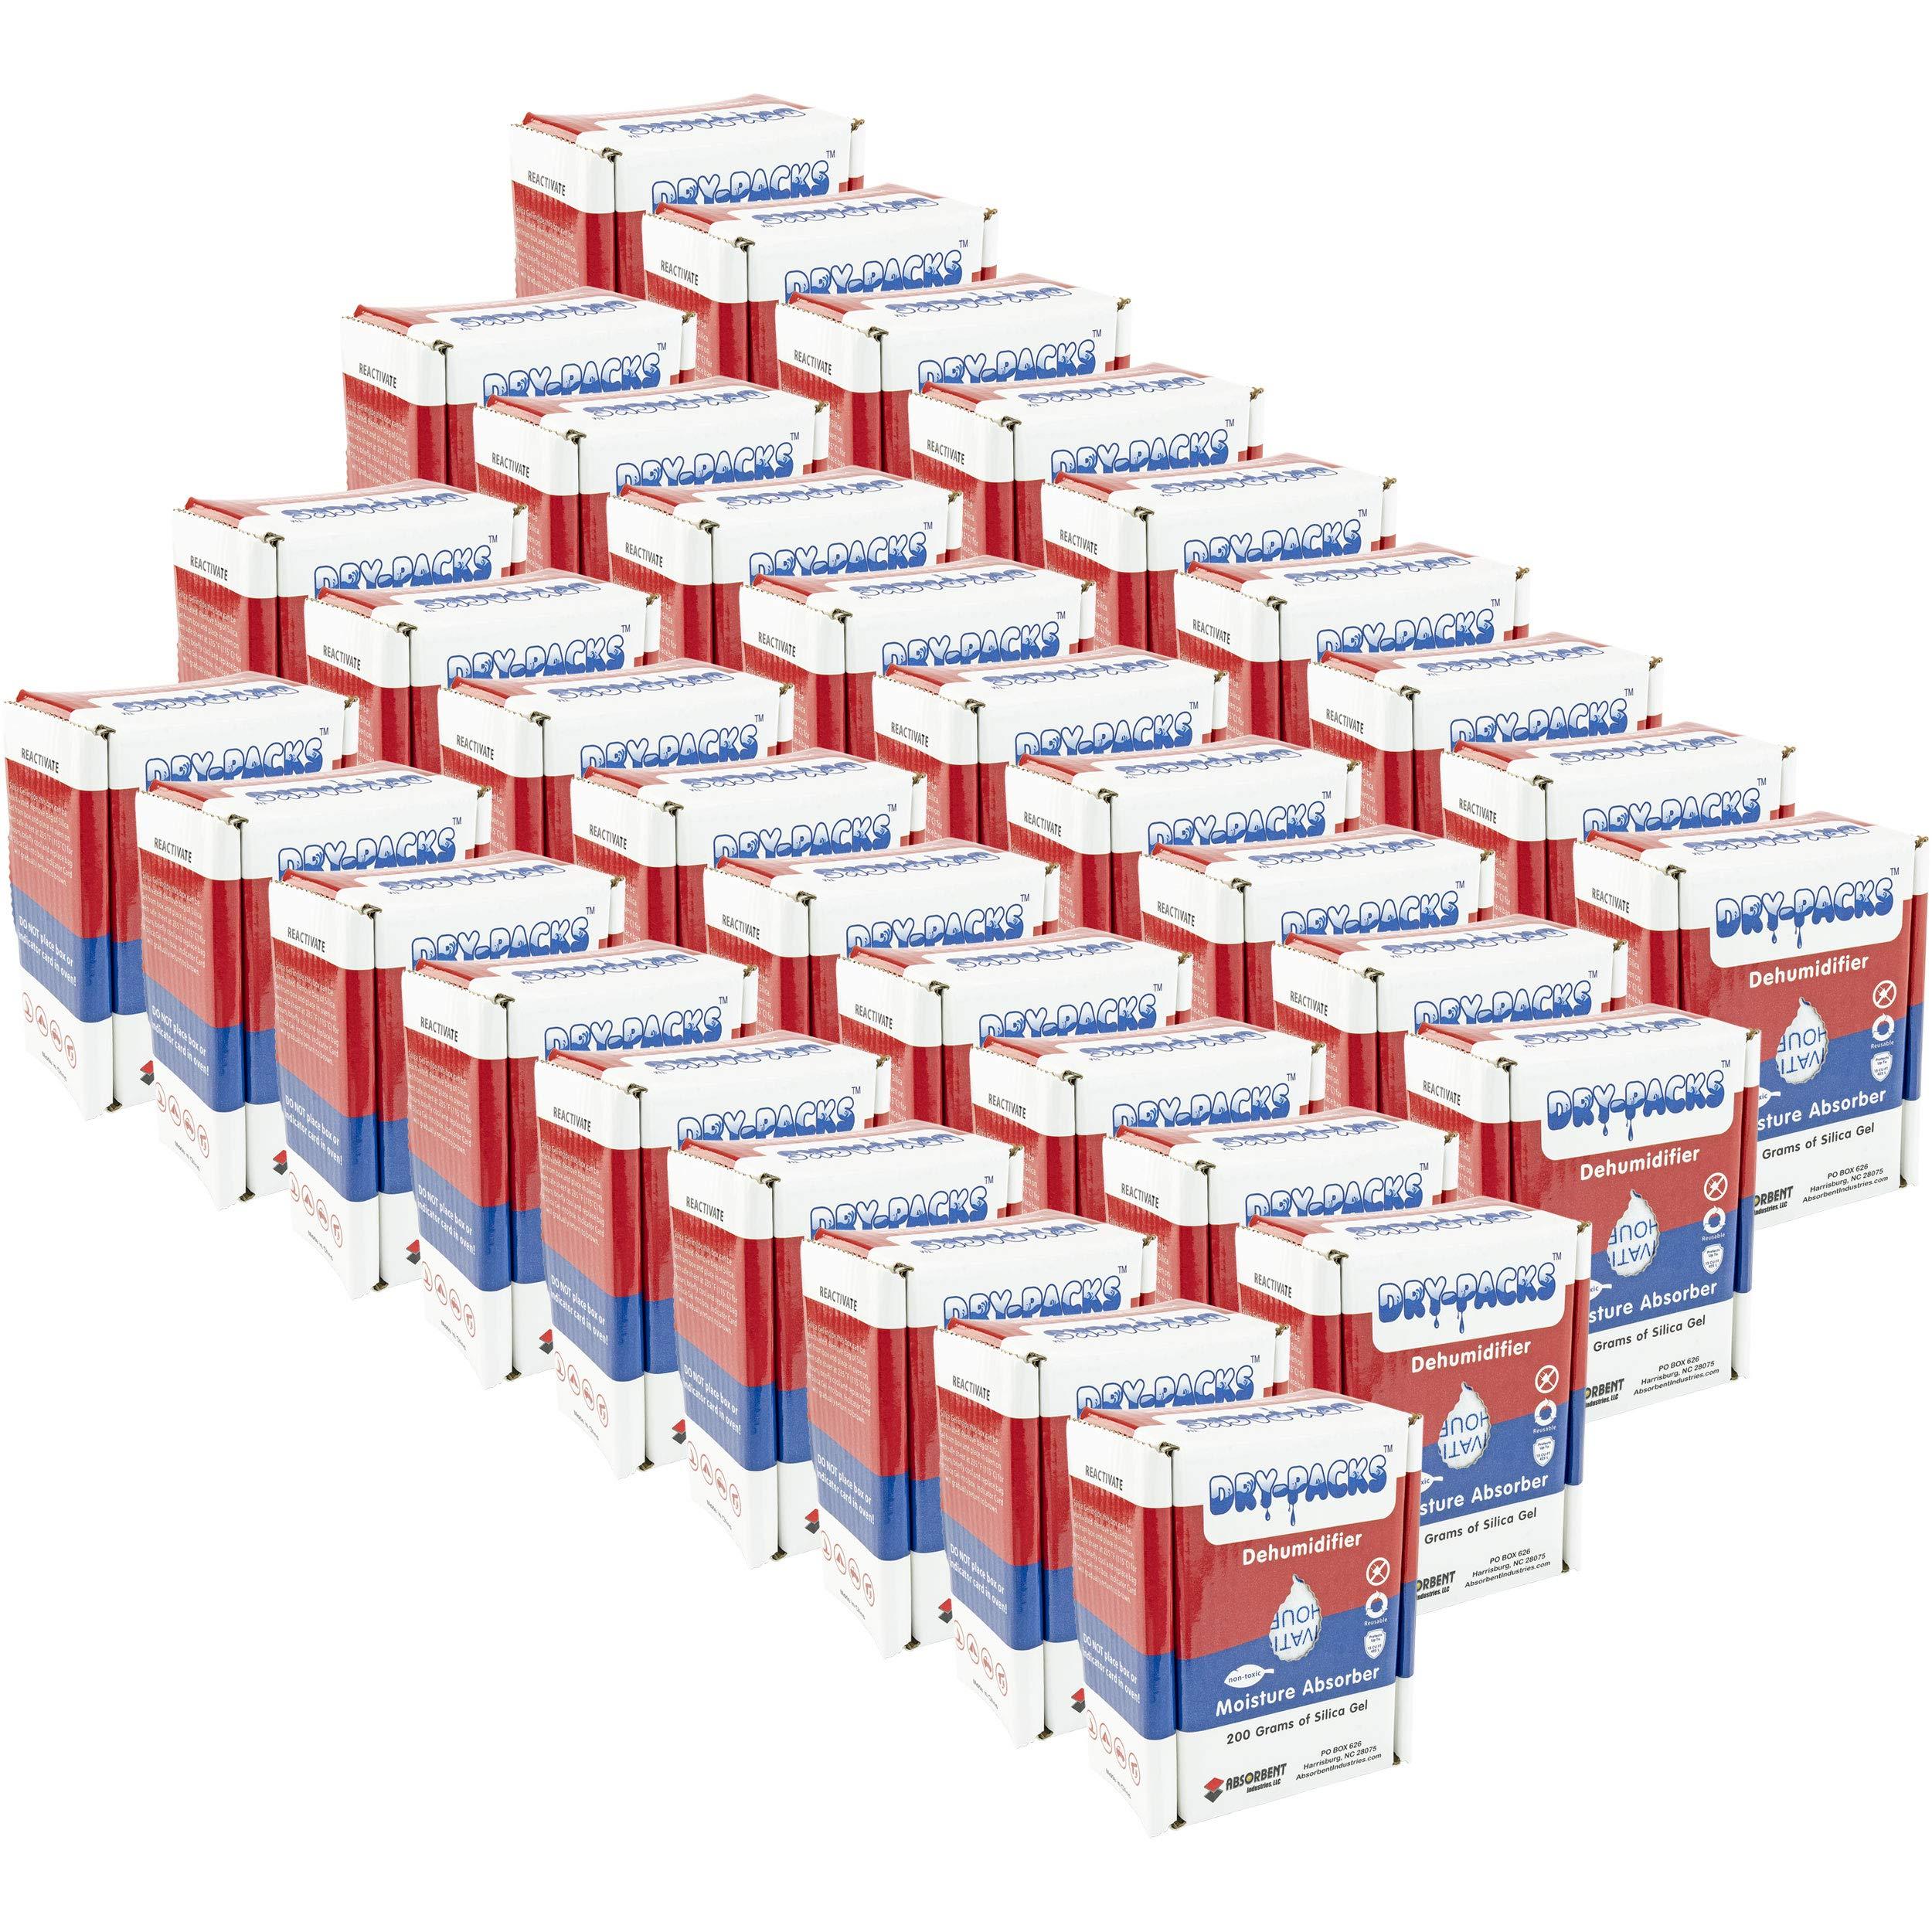 Dry-Packs DP200BOX-36pk 200gm Dehumidifying Box, Pack of 36, 36-Pack, White by Dry-Packs